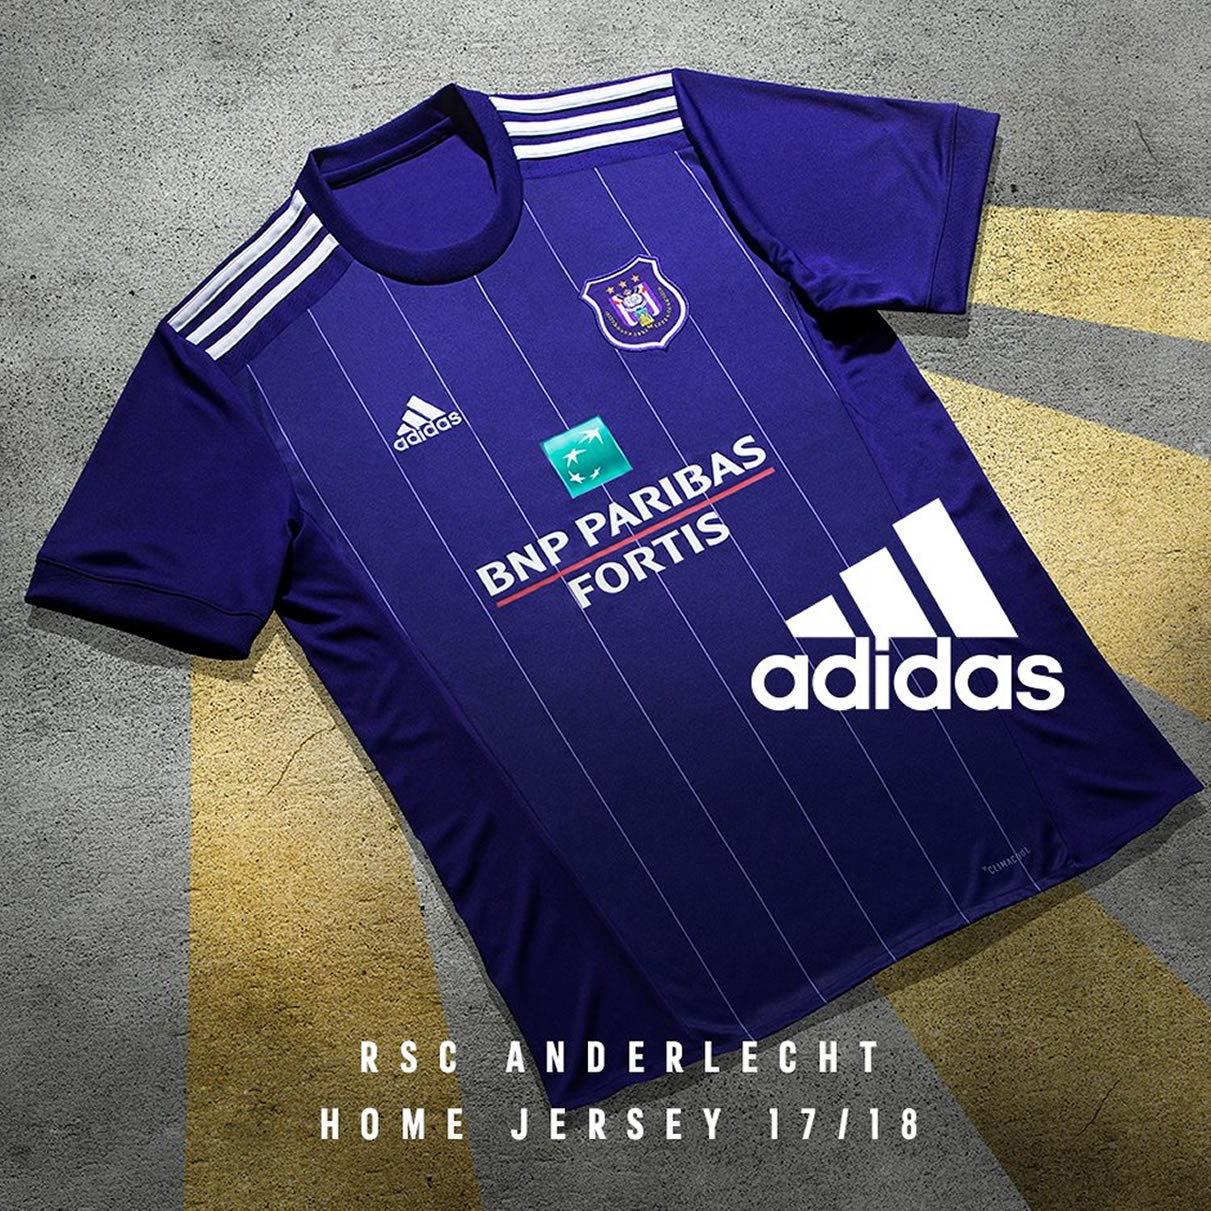 Camiseta titular Adidas del RSC Anderlecht | Foto Web Oficial